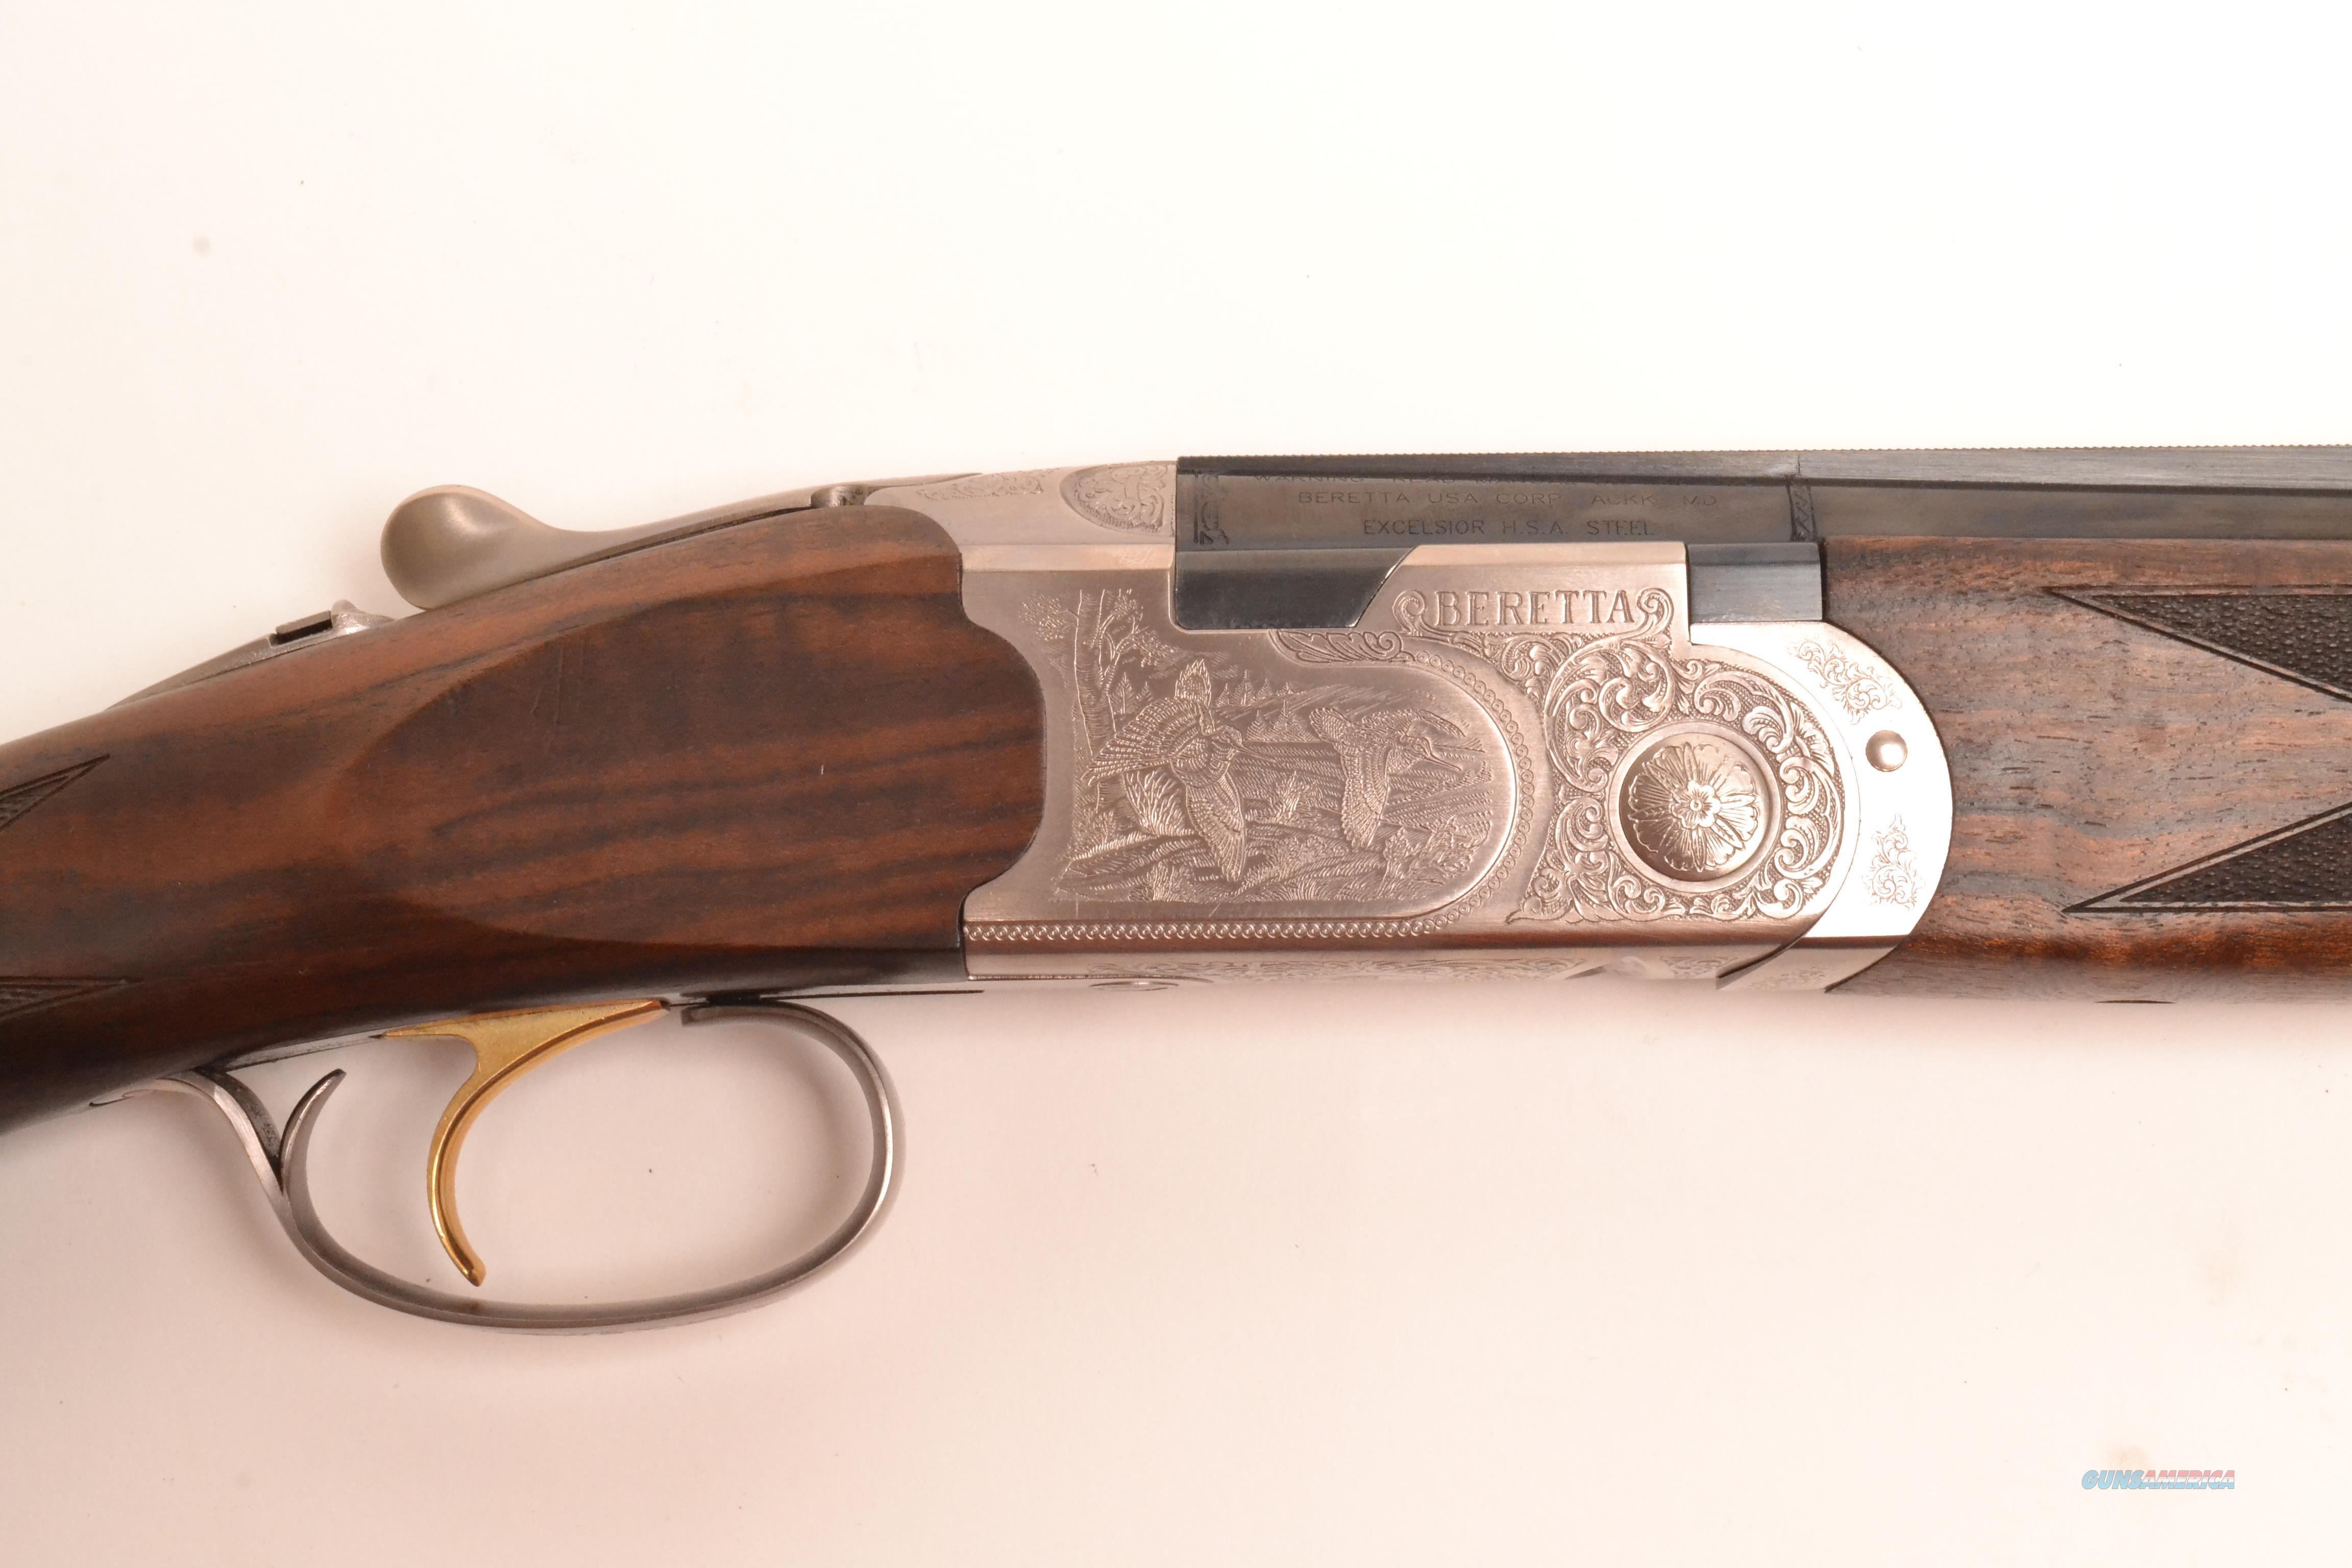 Beretta - 687 Silver Pigeon III, Two Barrel Set, 28ga/.410ga  Guns > Shotguns > Beretta Shotguns > O/U > Hunting